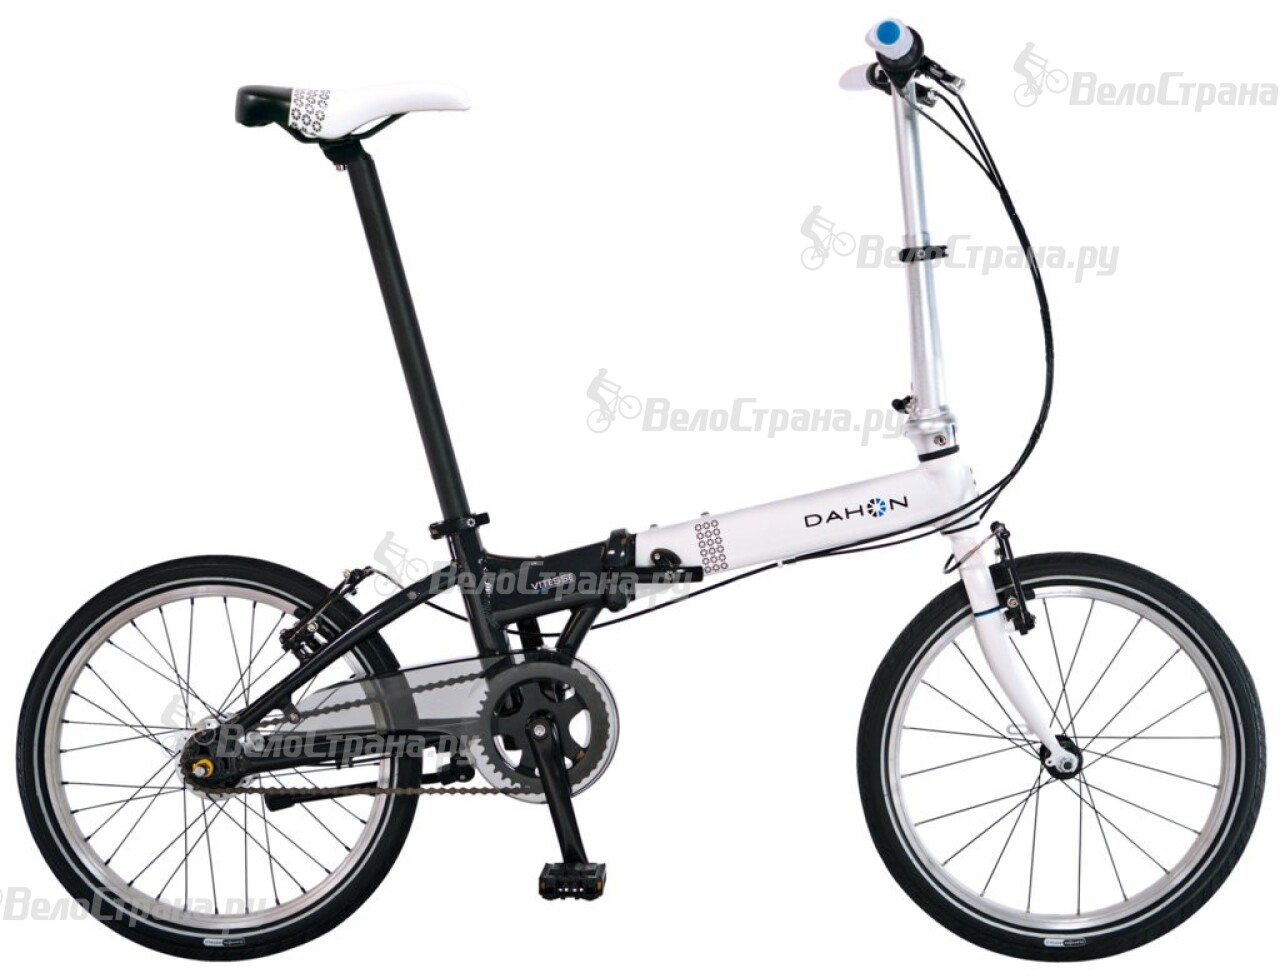 Велосипед Dahon Vitesse D7HG (2014) велосипед pegasus piazza gent 7 sp 28 2016